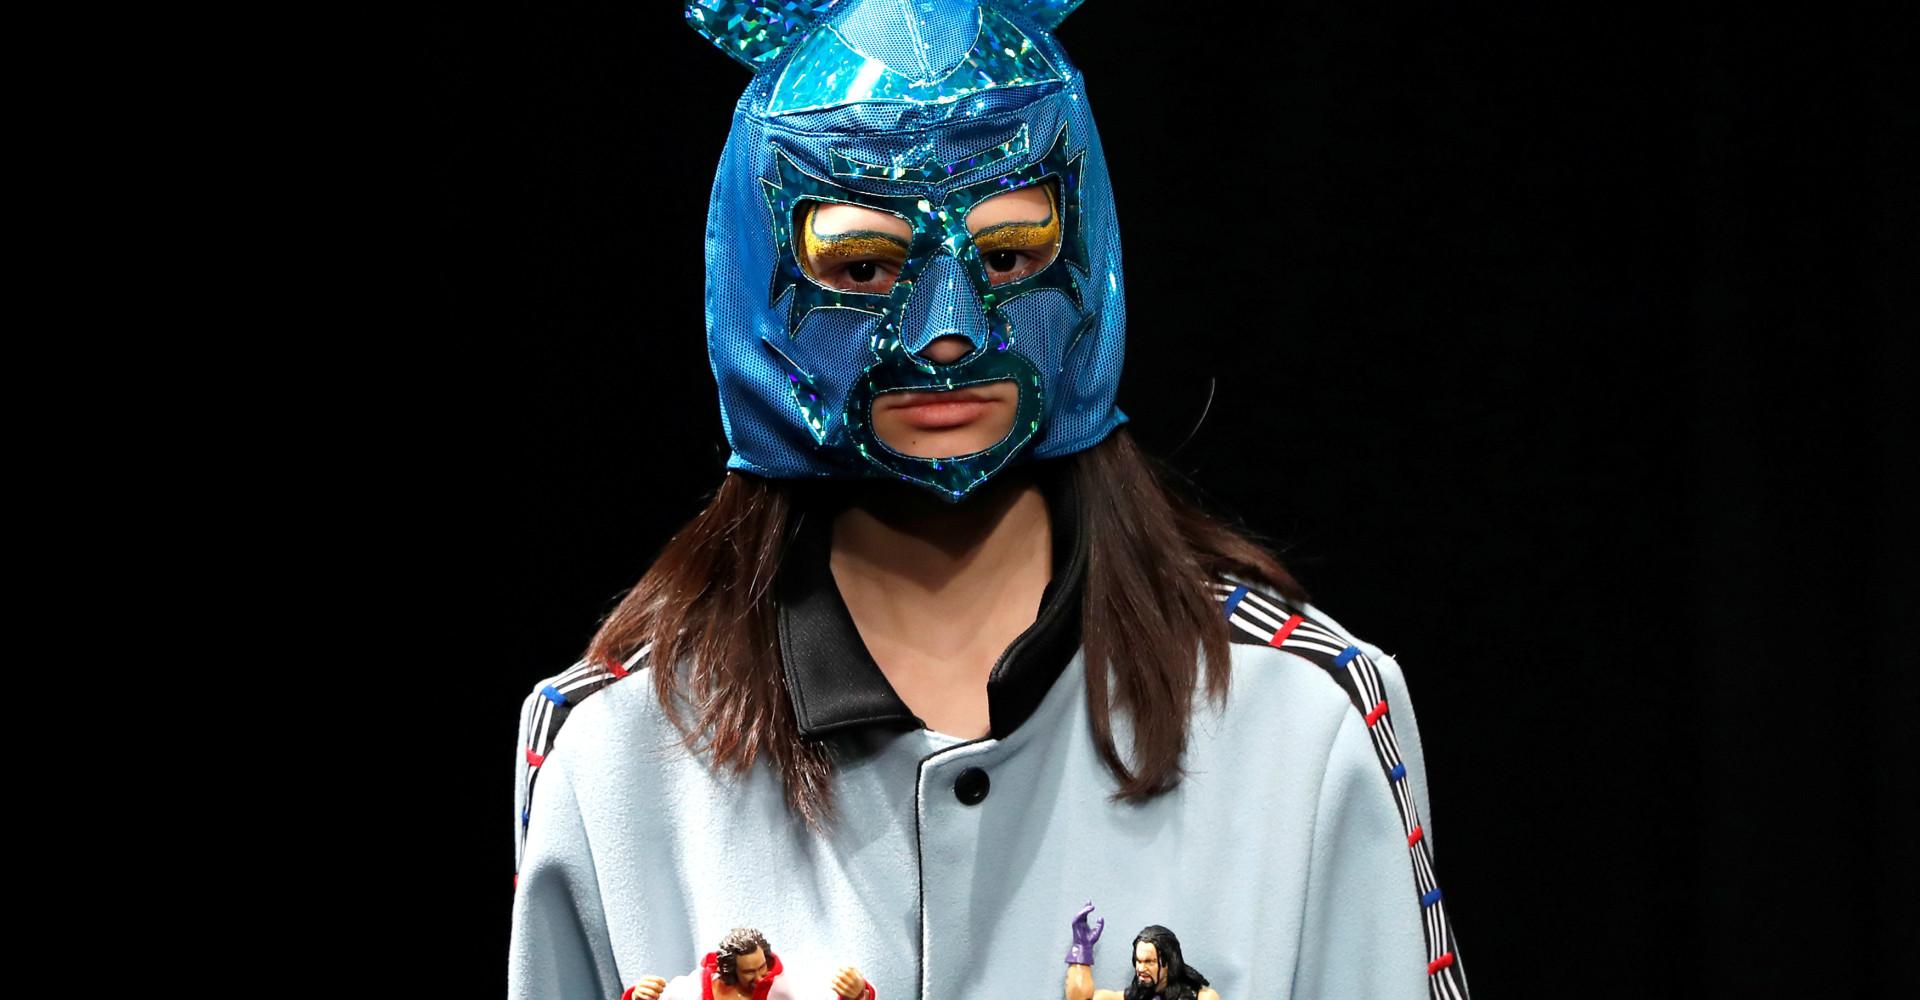 Tokyo's extravagant Fashion Week